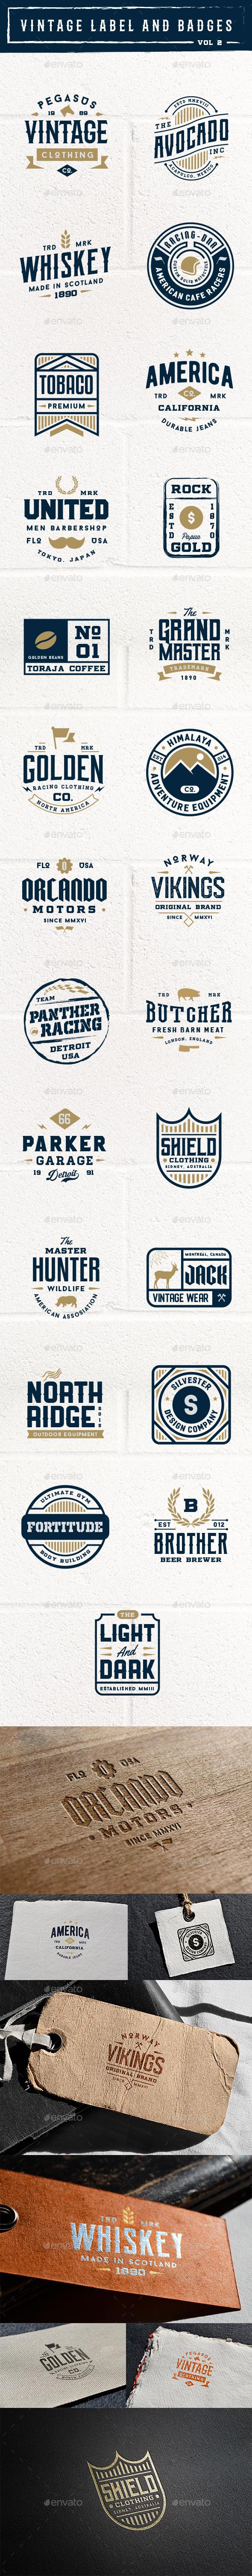 Vintage Label and Badges Vol 2 - Badges & Stickers Web Elements